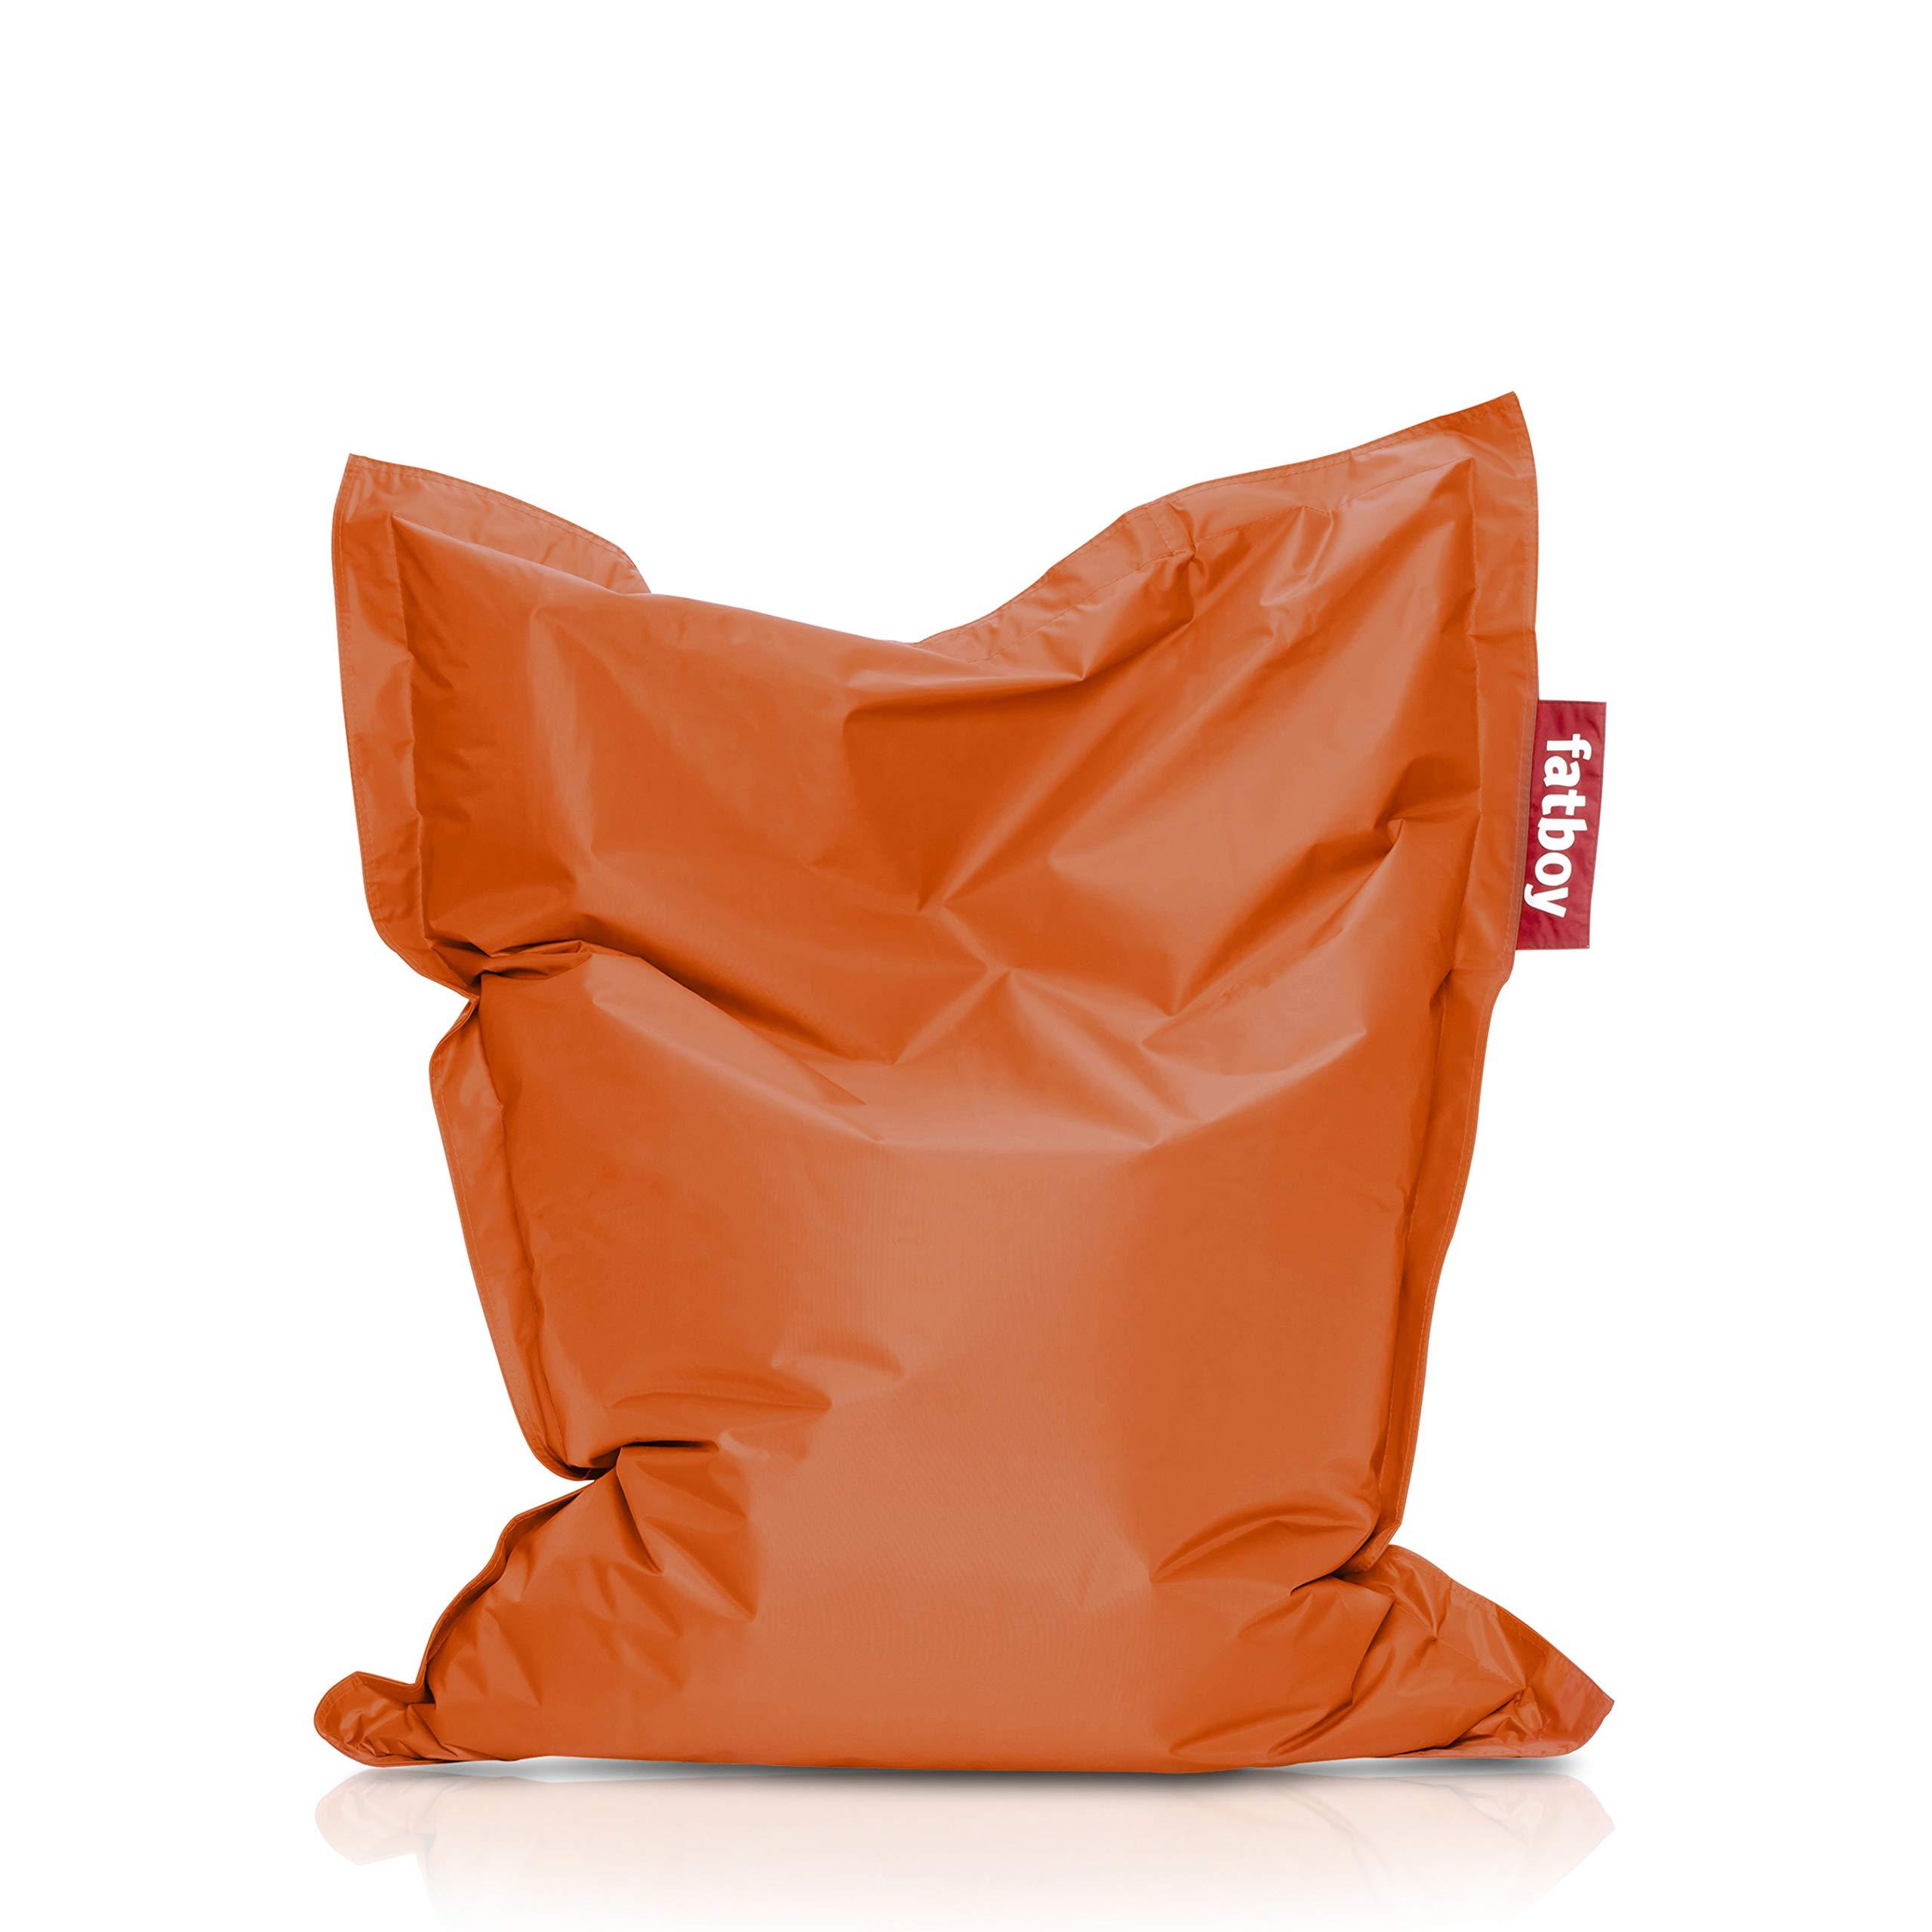 Fatboy USA Original Slim Bean Bag Chair, Orange by Fatboy USA